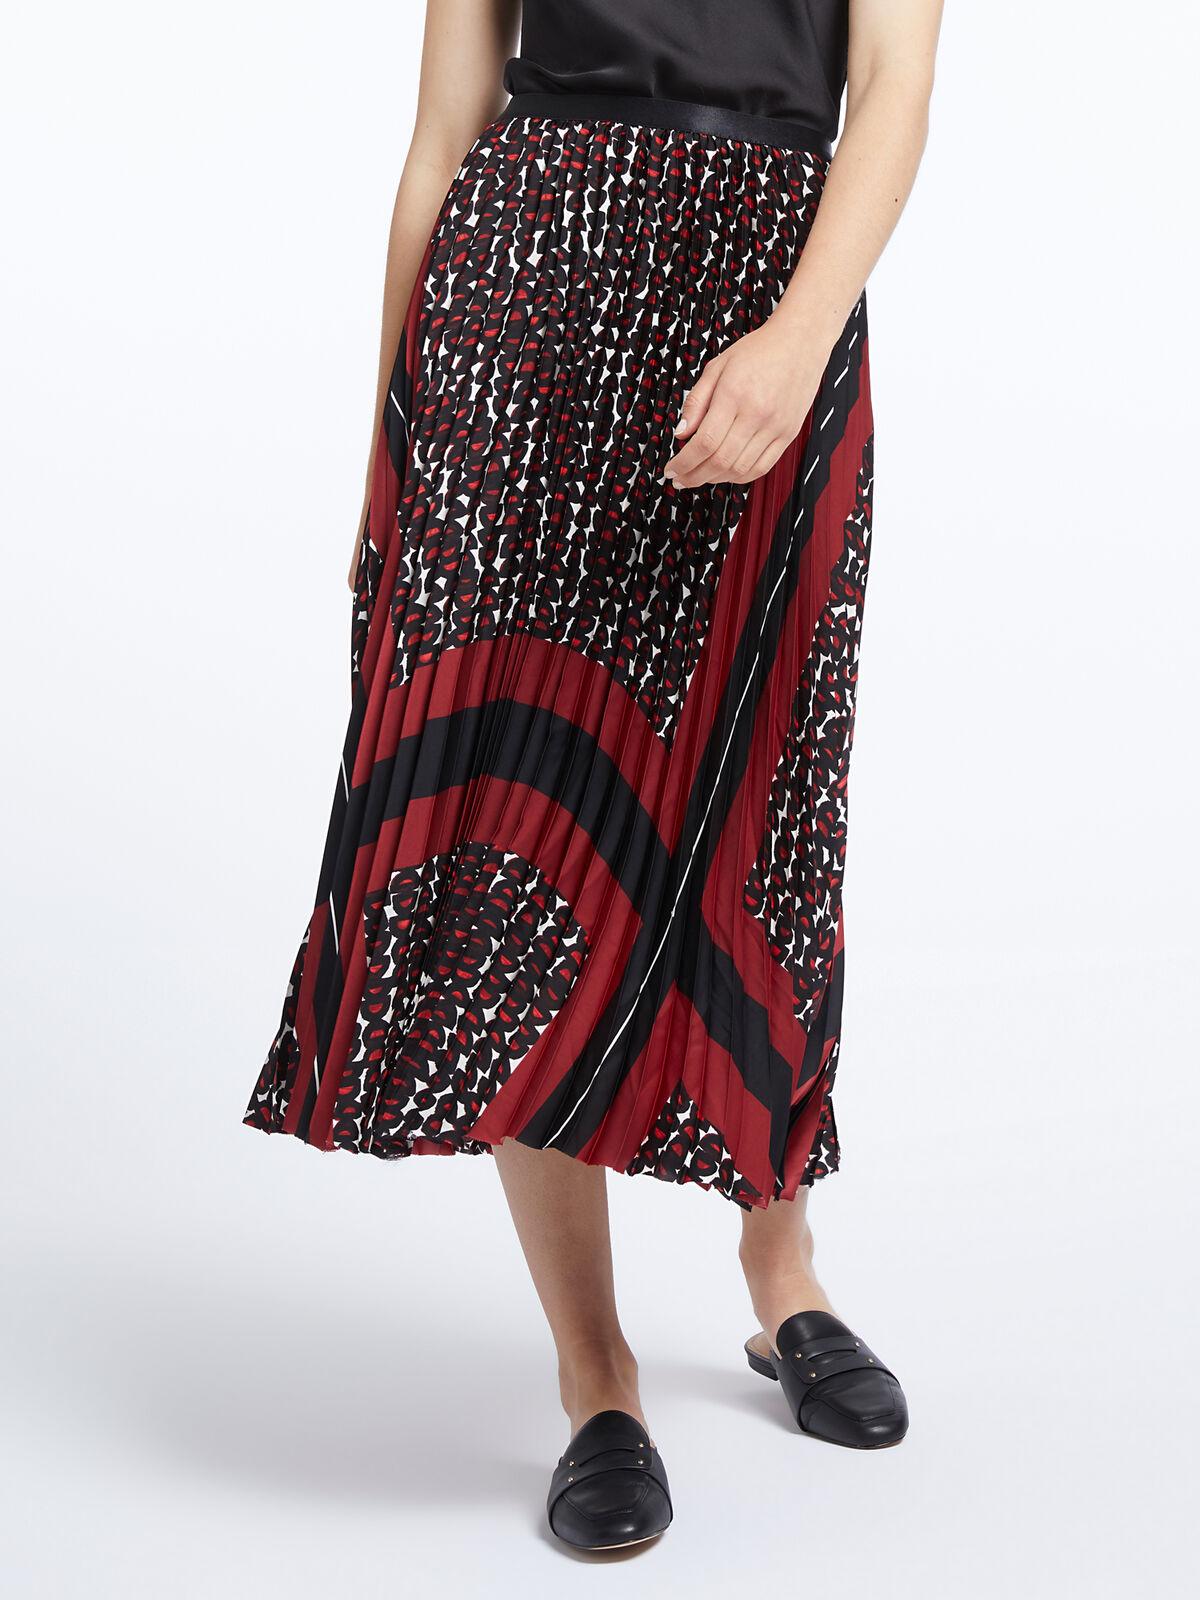 Darling Pleat Skirt